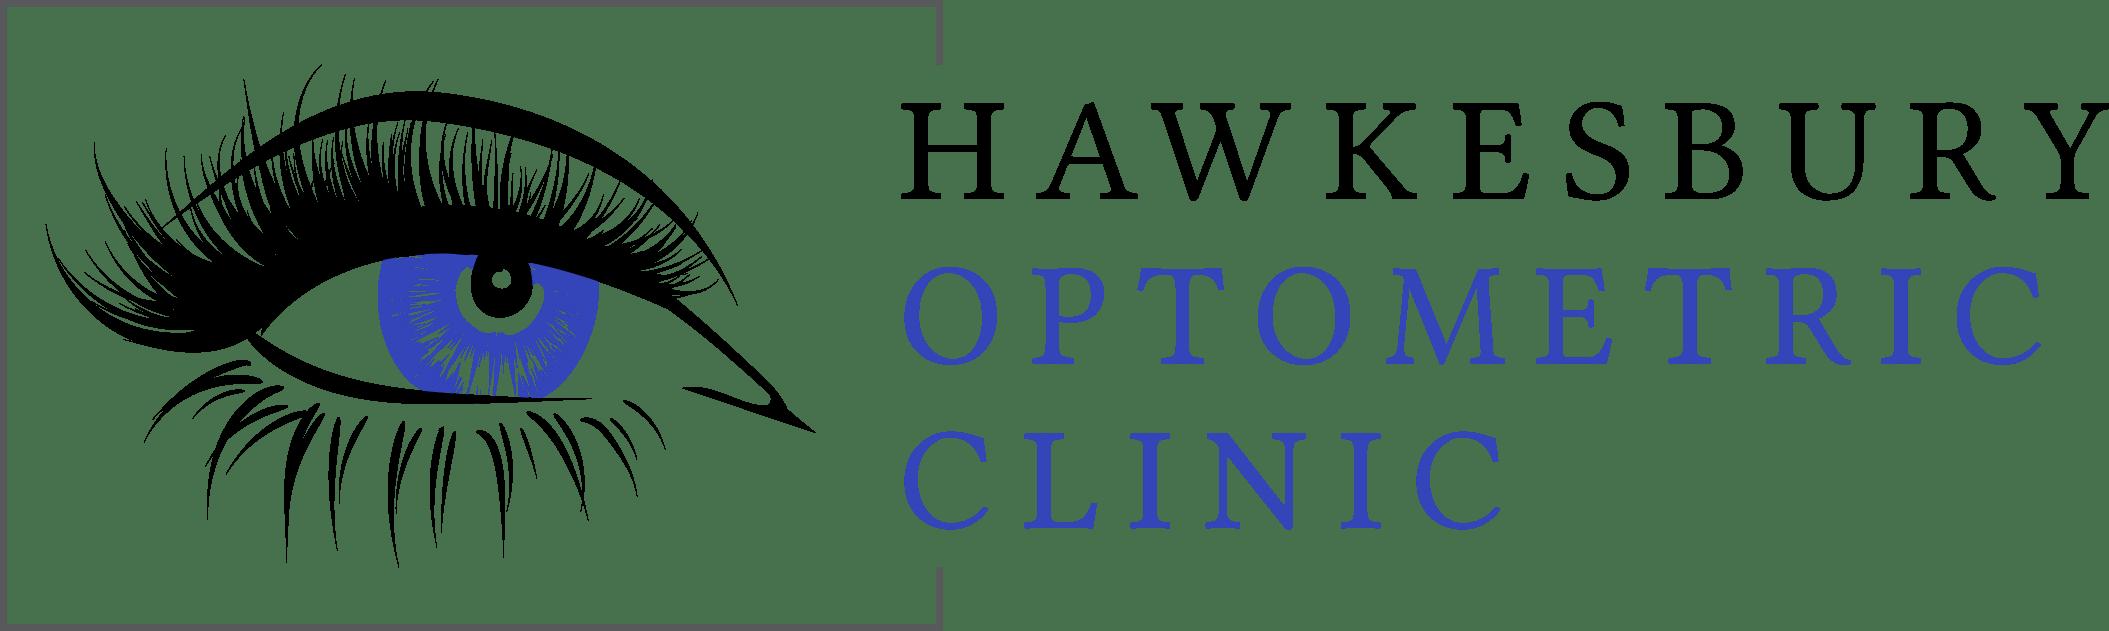 Hawkesbury Optometric